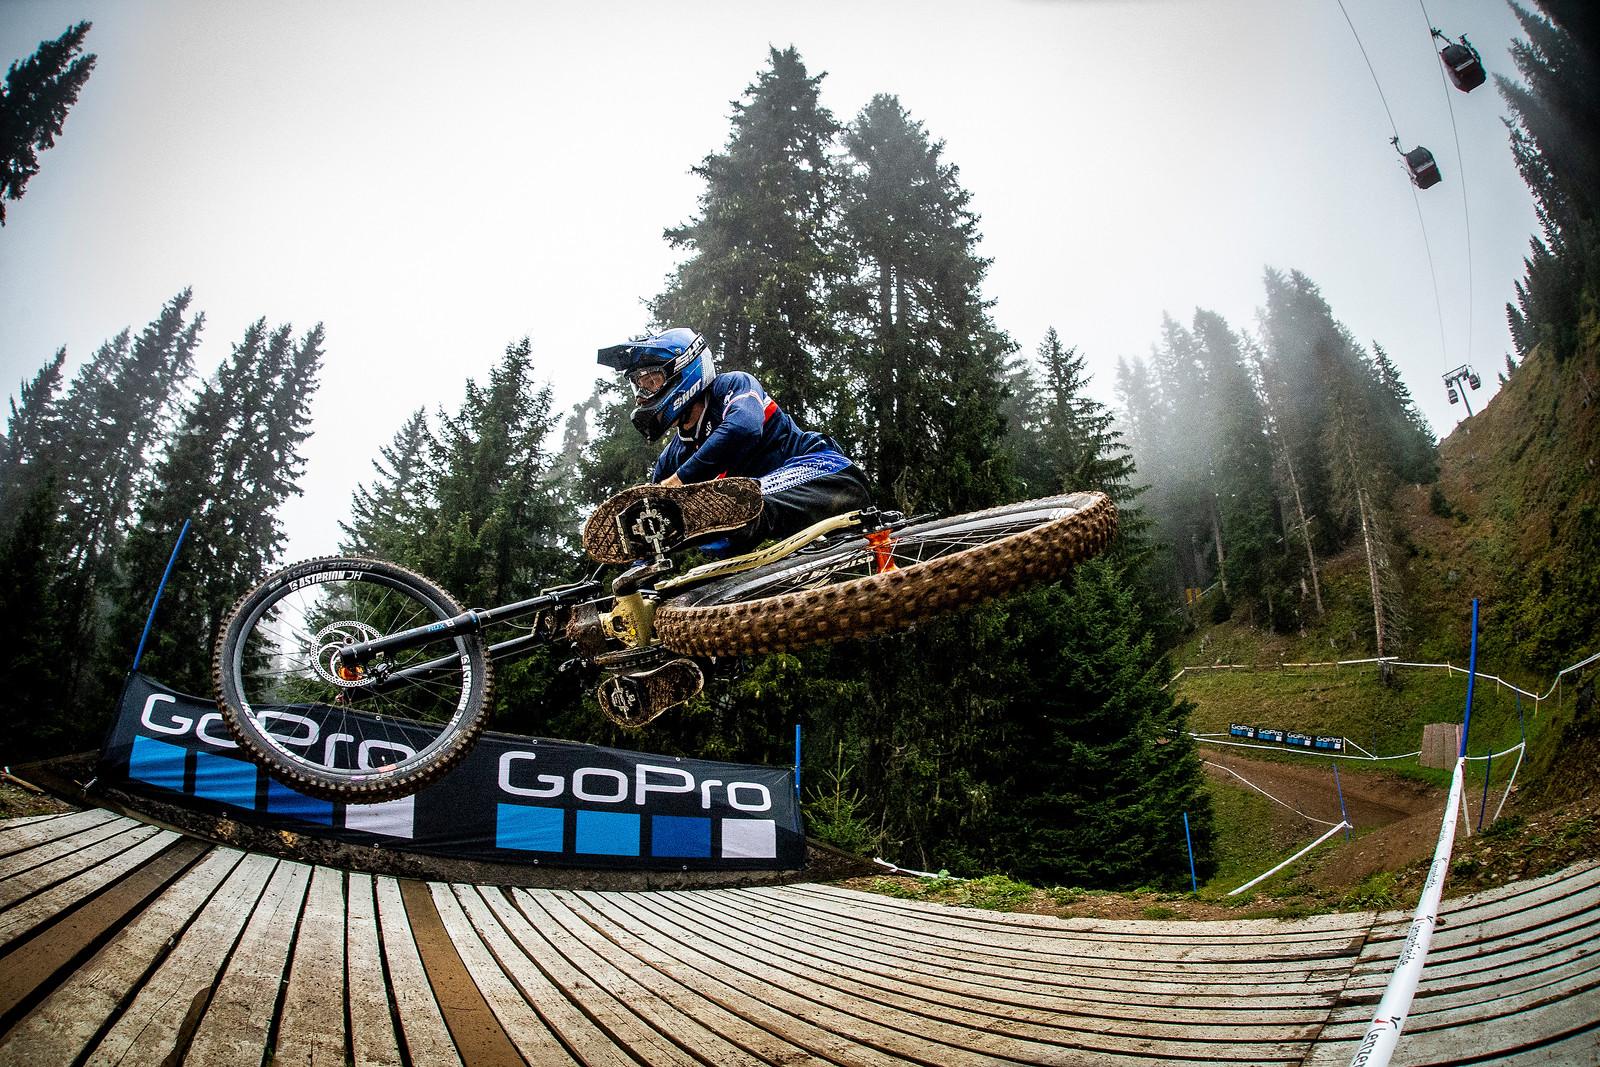 Lenzer18  H1D6107 - WORLD CHAMPS WHIPFEST - Mountain Biking Pictures - Vital MTB